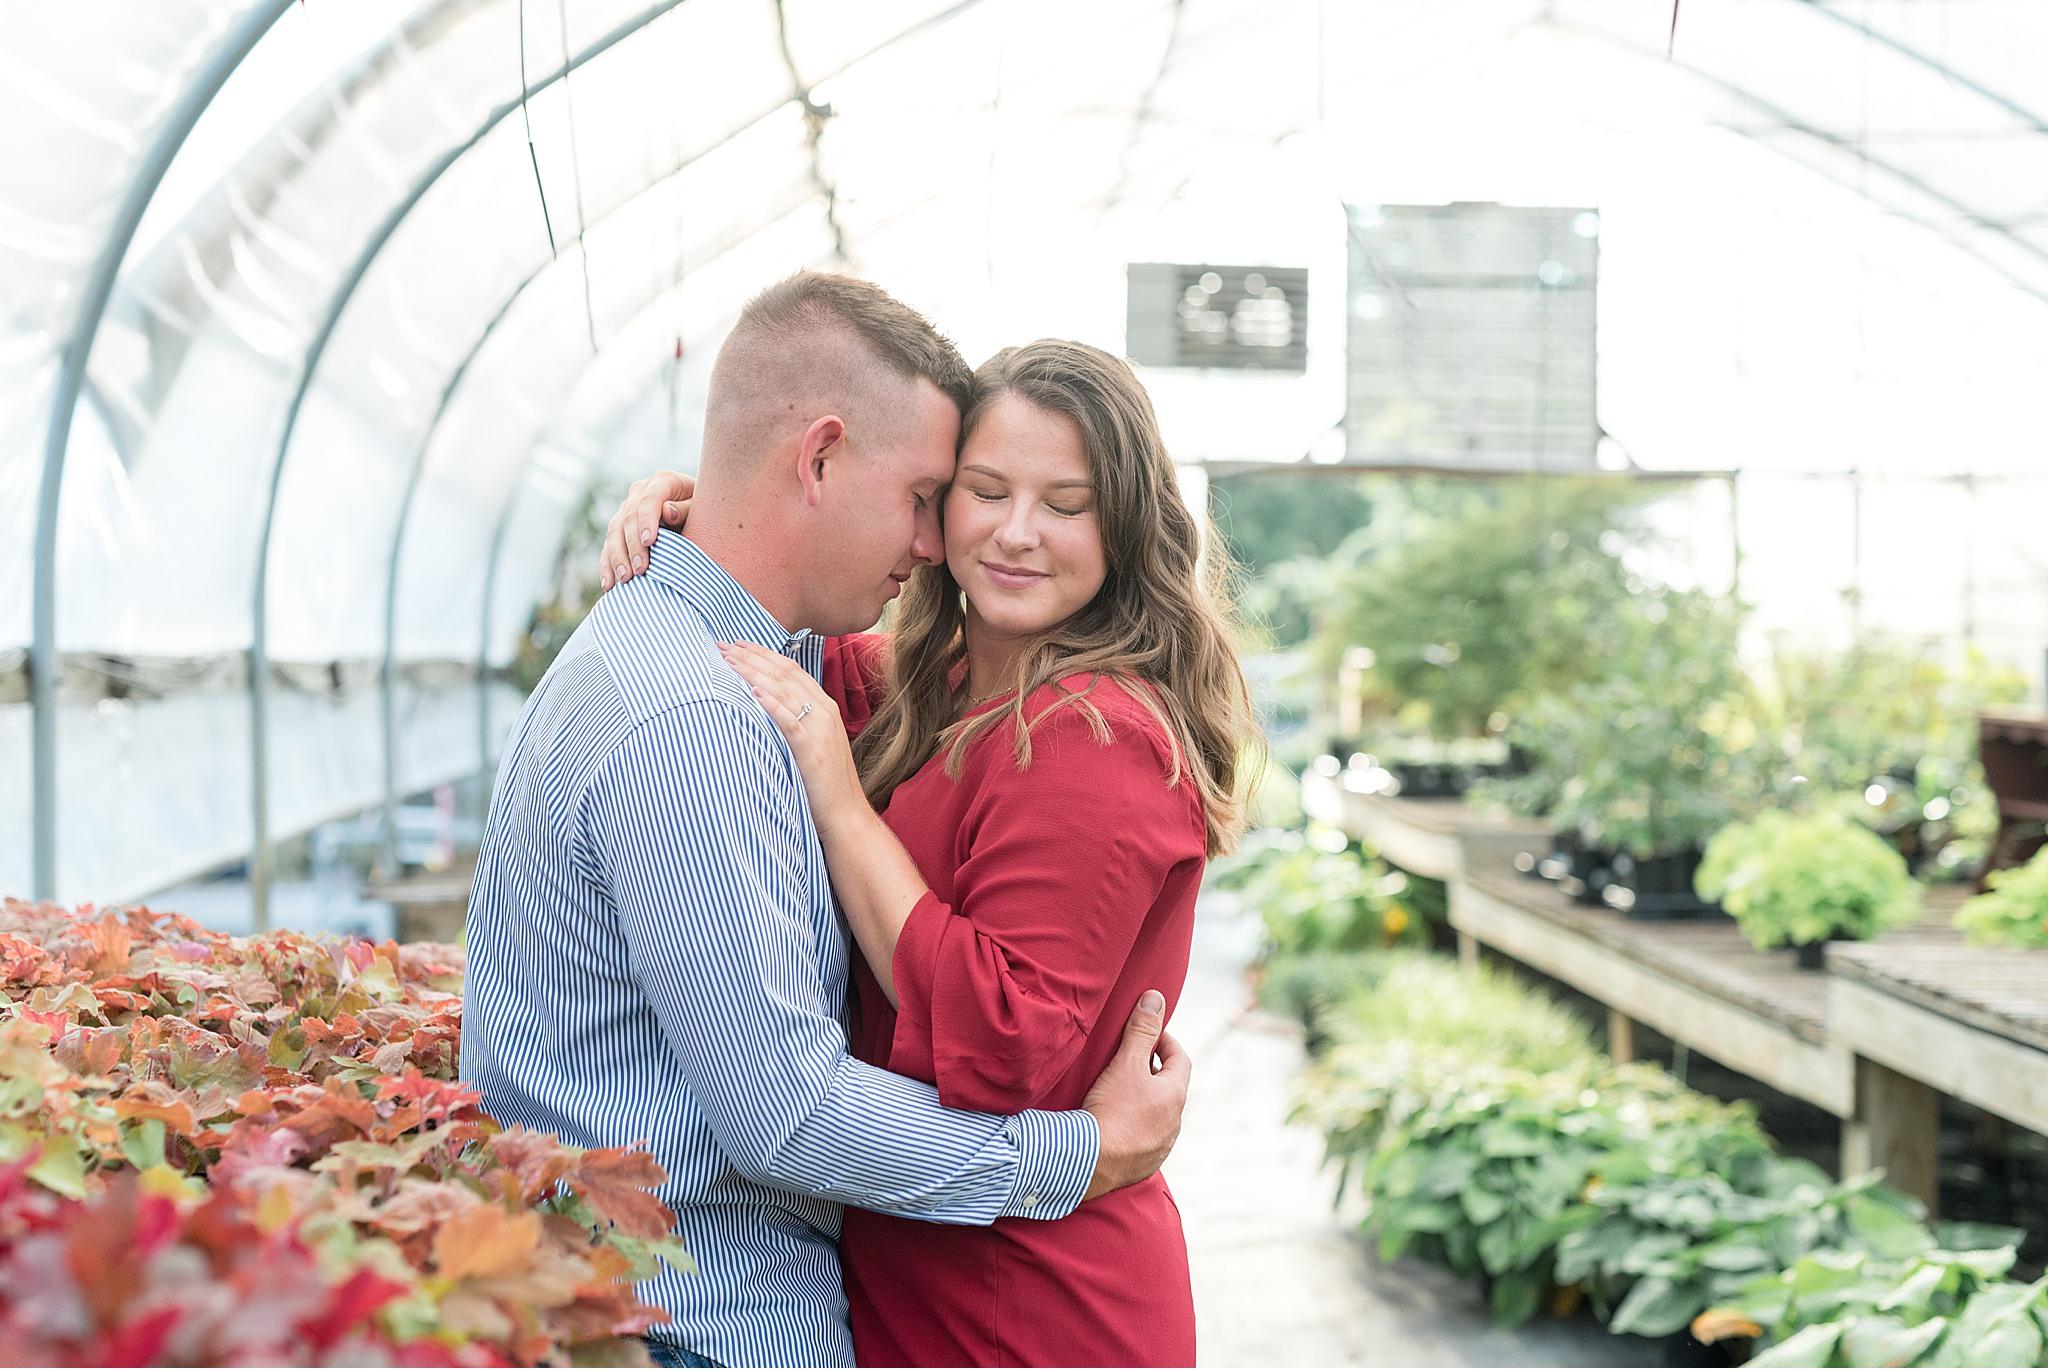 Tudbinks Greenhouse Lancaster PA wedding engagement photography_3961.jpg